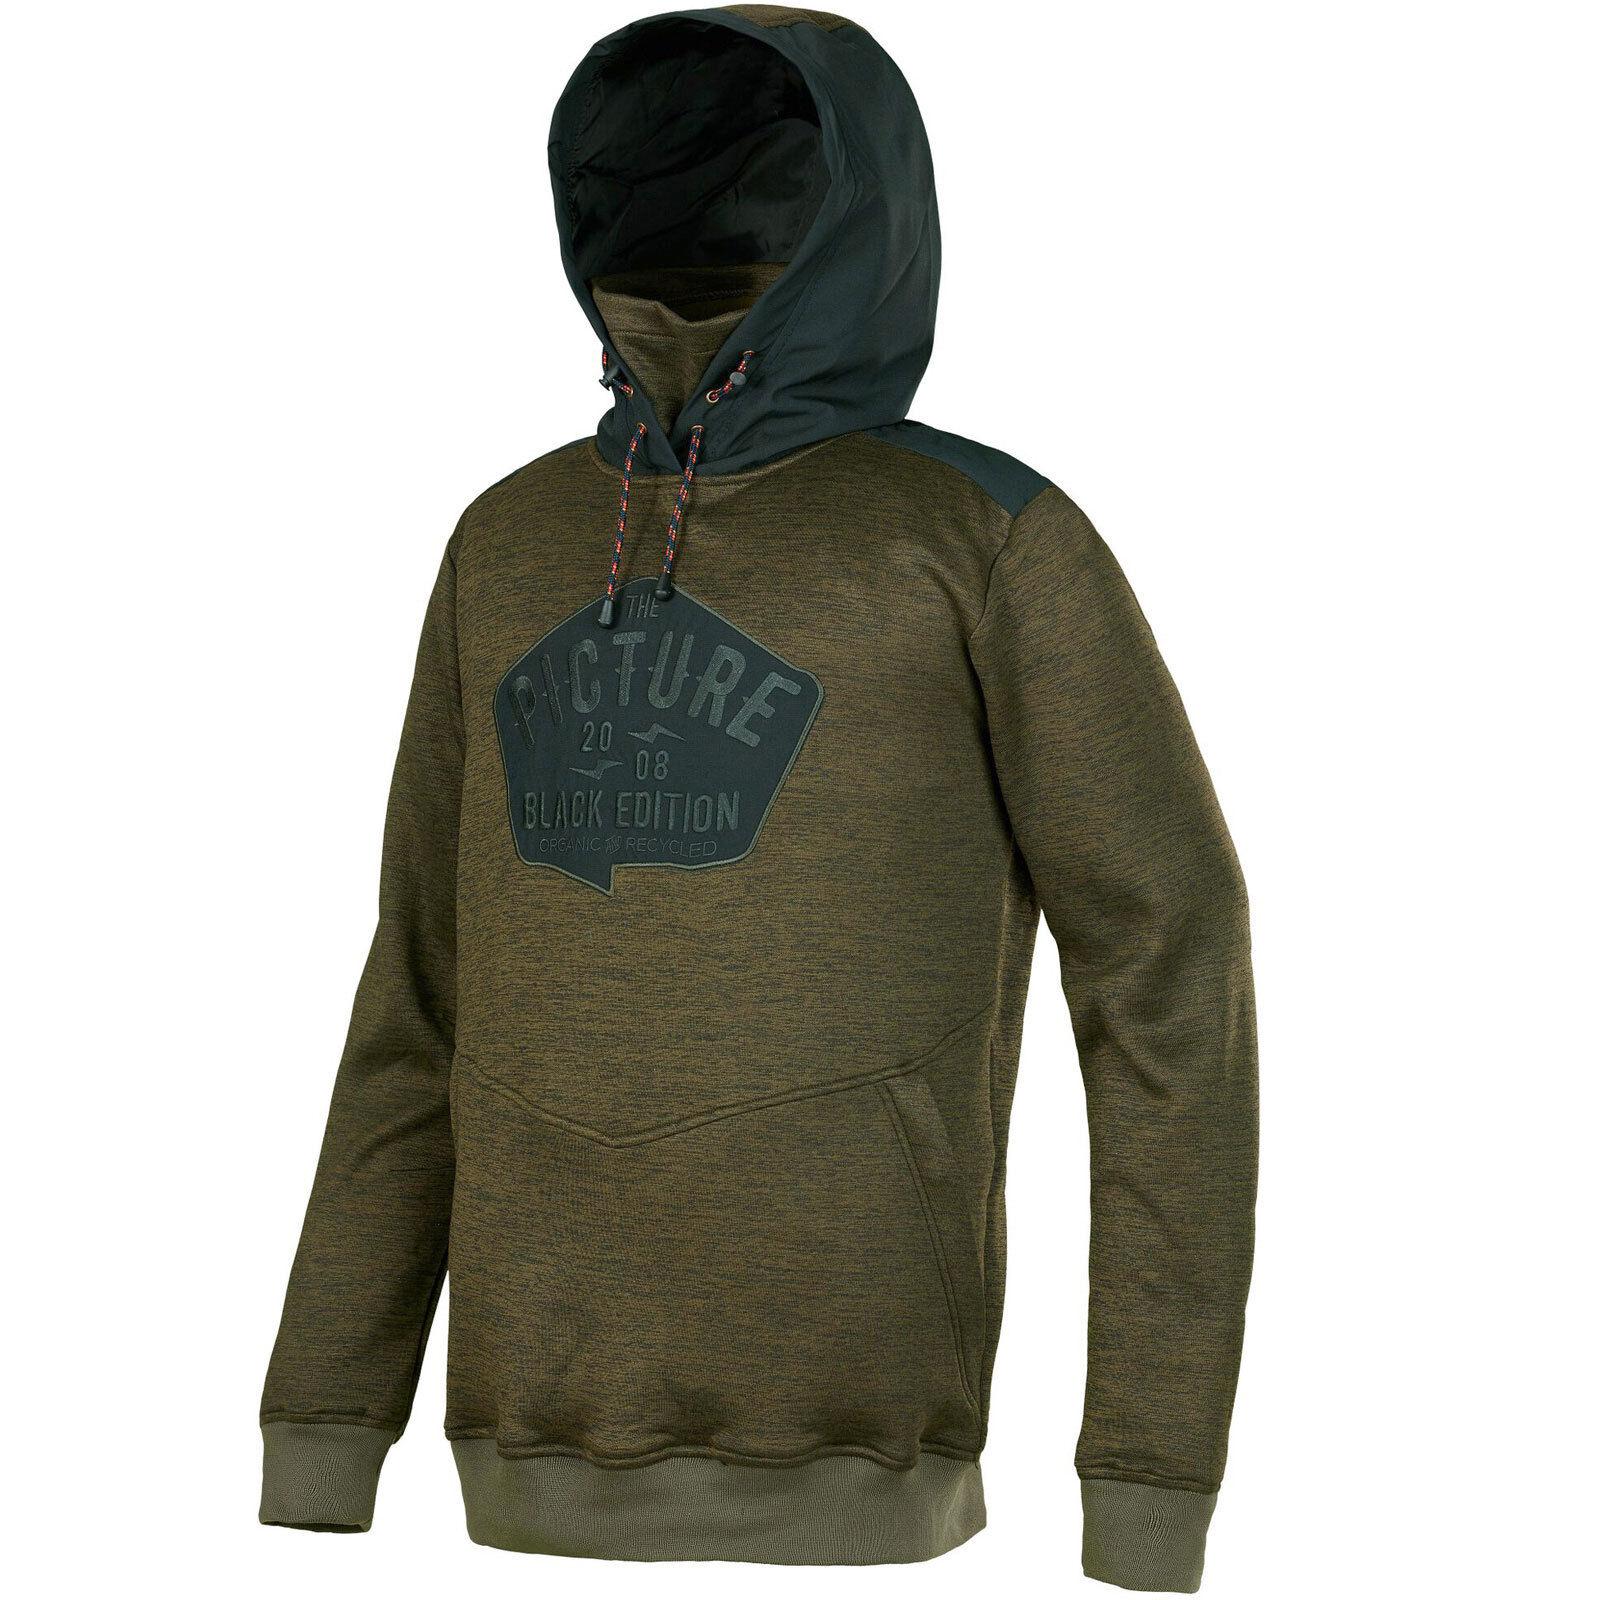 PENN Angeln Fischen Pullover Kapuzenpullover XL Penn Hoody *NEU MIT ETIKETT* Pullover & Sweaters